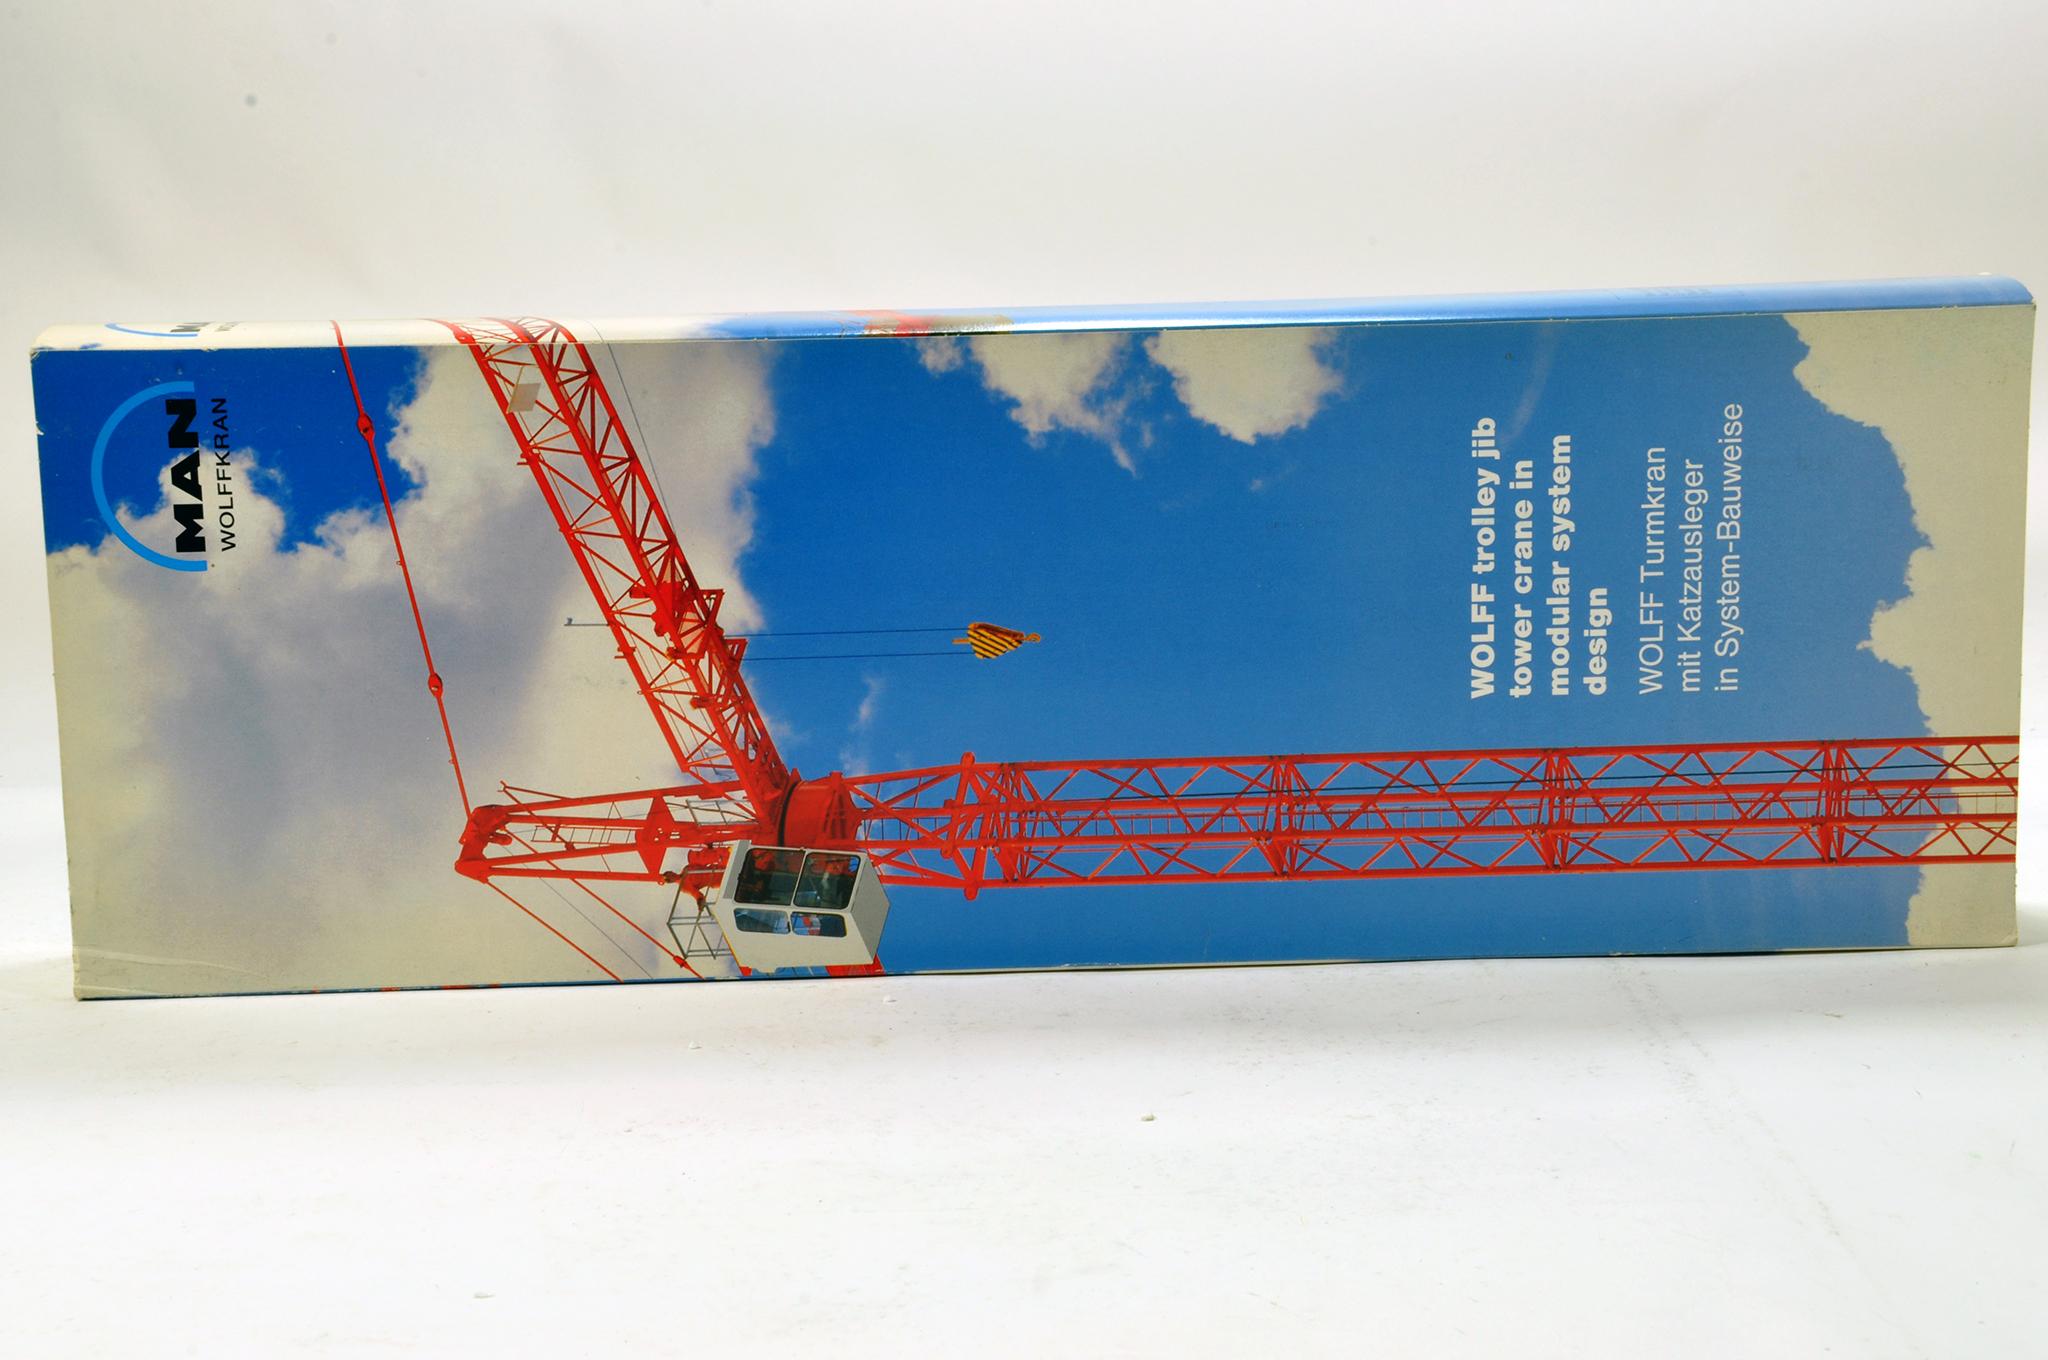 Lot 318 - Conrad 1/87 Construction issue comprising MAN Wolffkran Tower Crane. Generally E to NM.